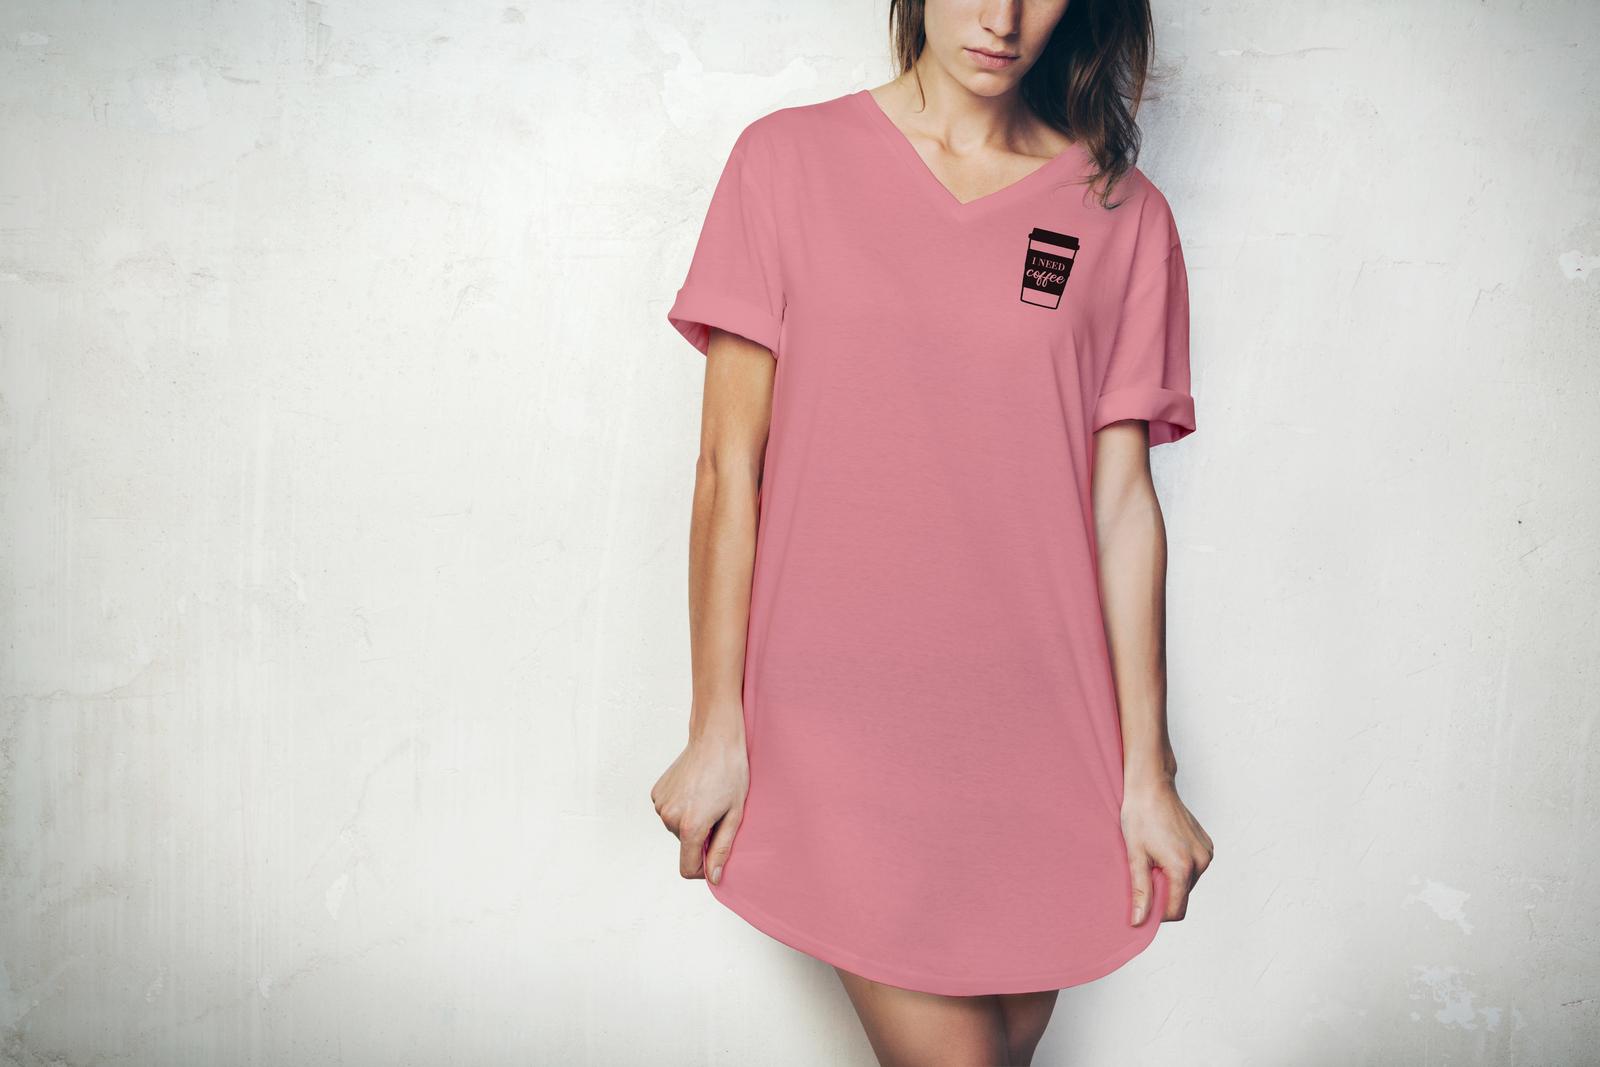 Hello Mello: I Need Coffee V-Neck Sleep Shirt - M-L image